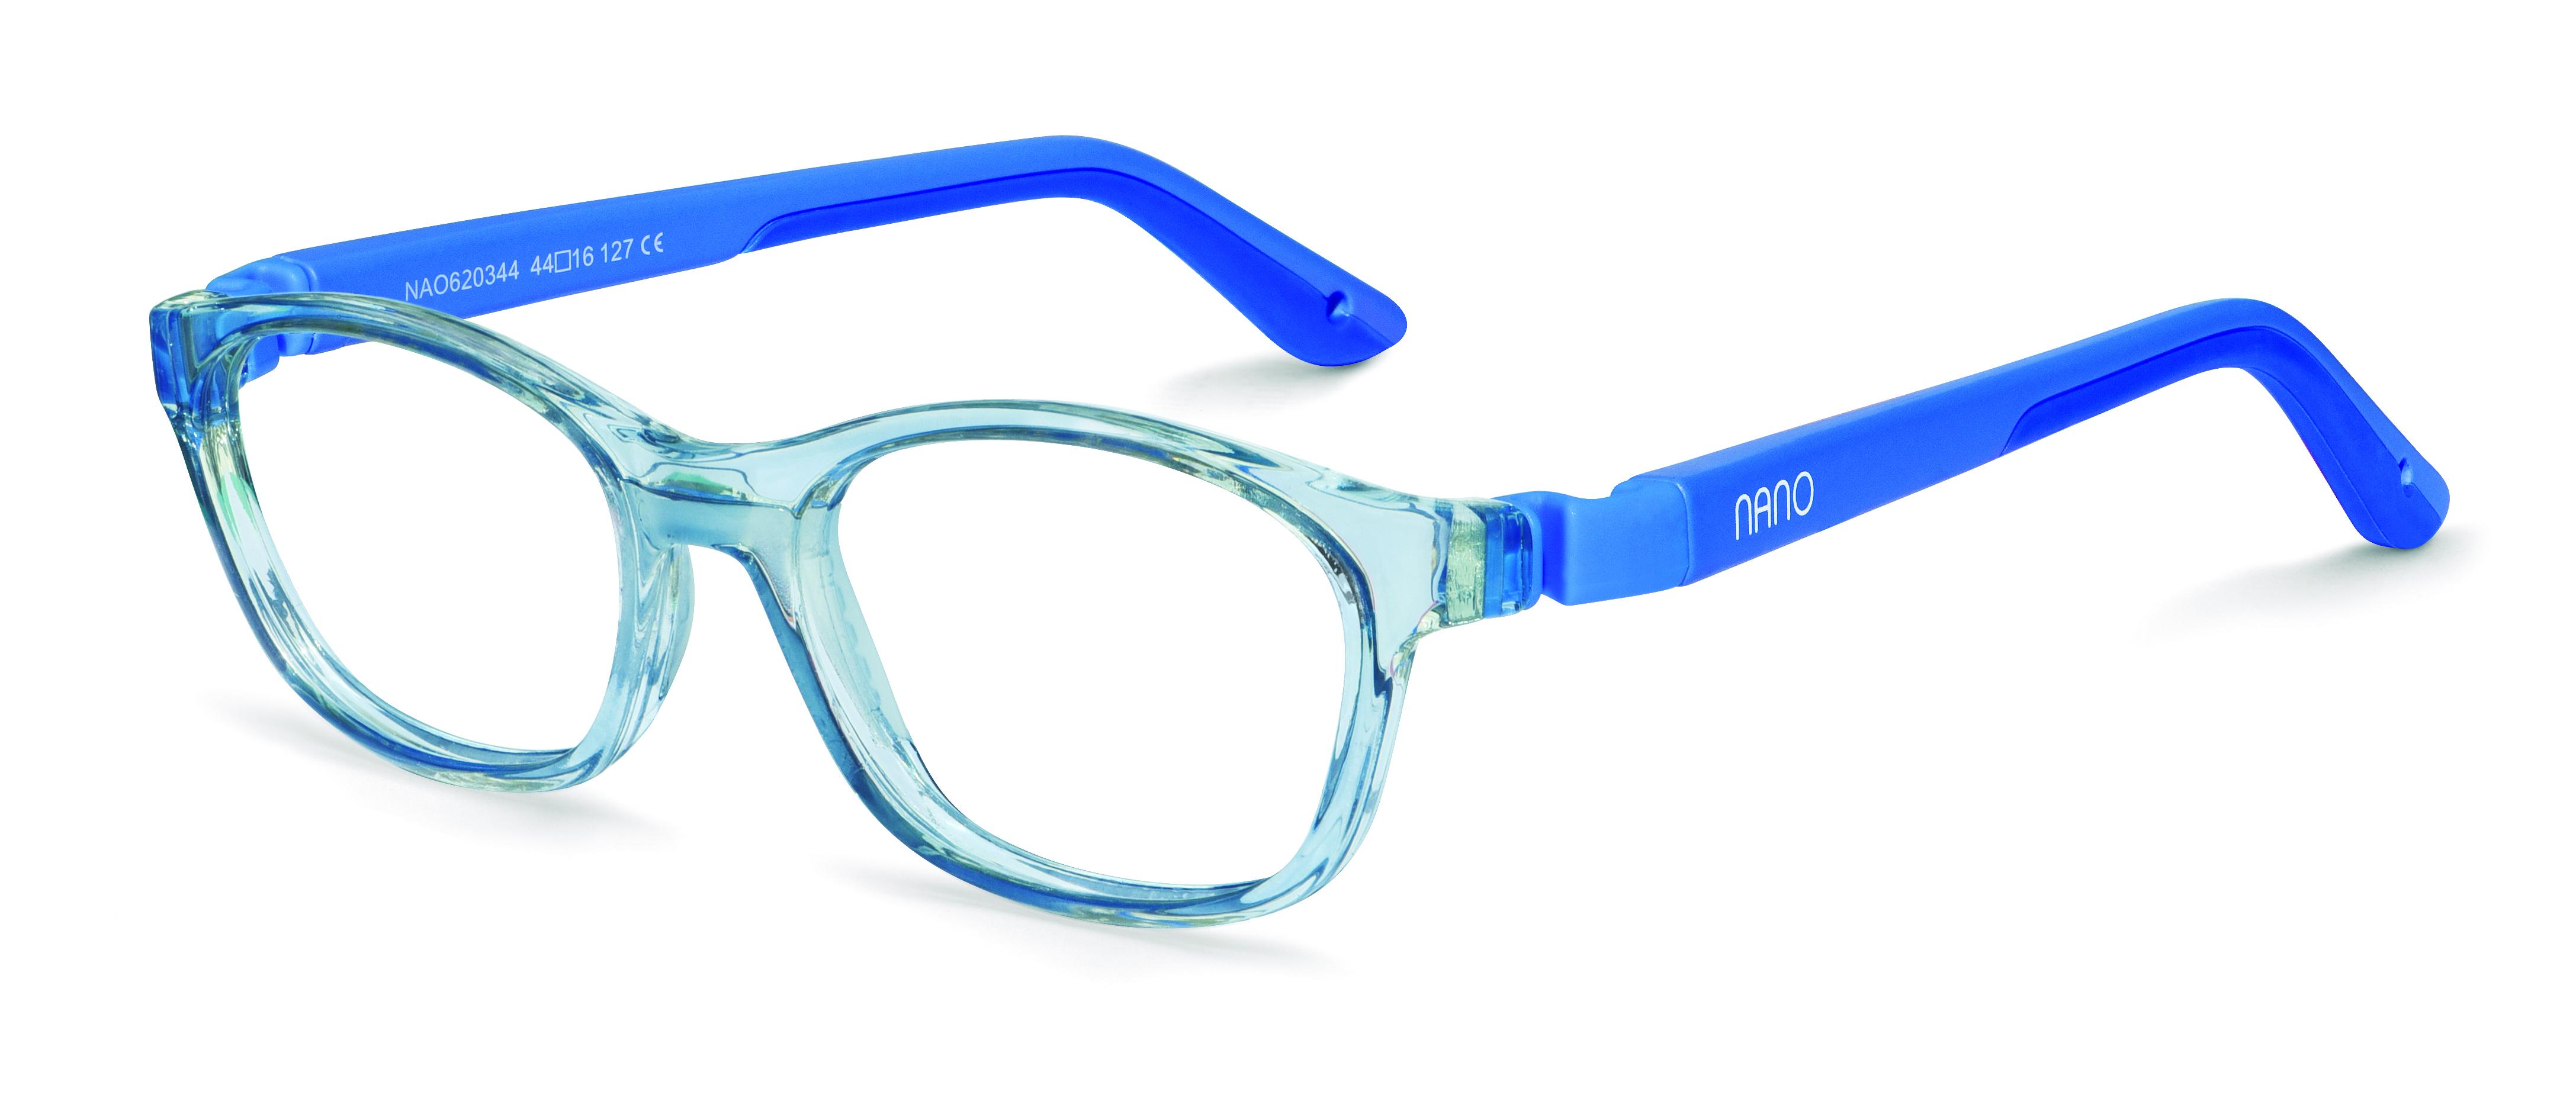 66773ad6b9c Eyewear for Kids - Nano Vista - Optiwow